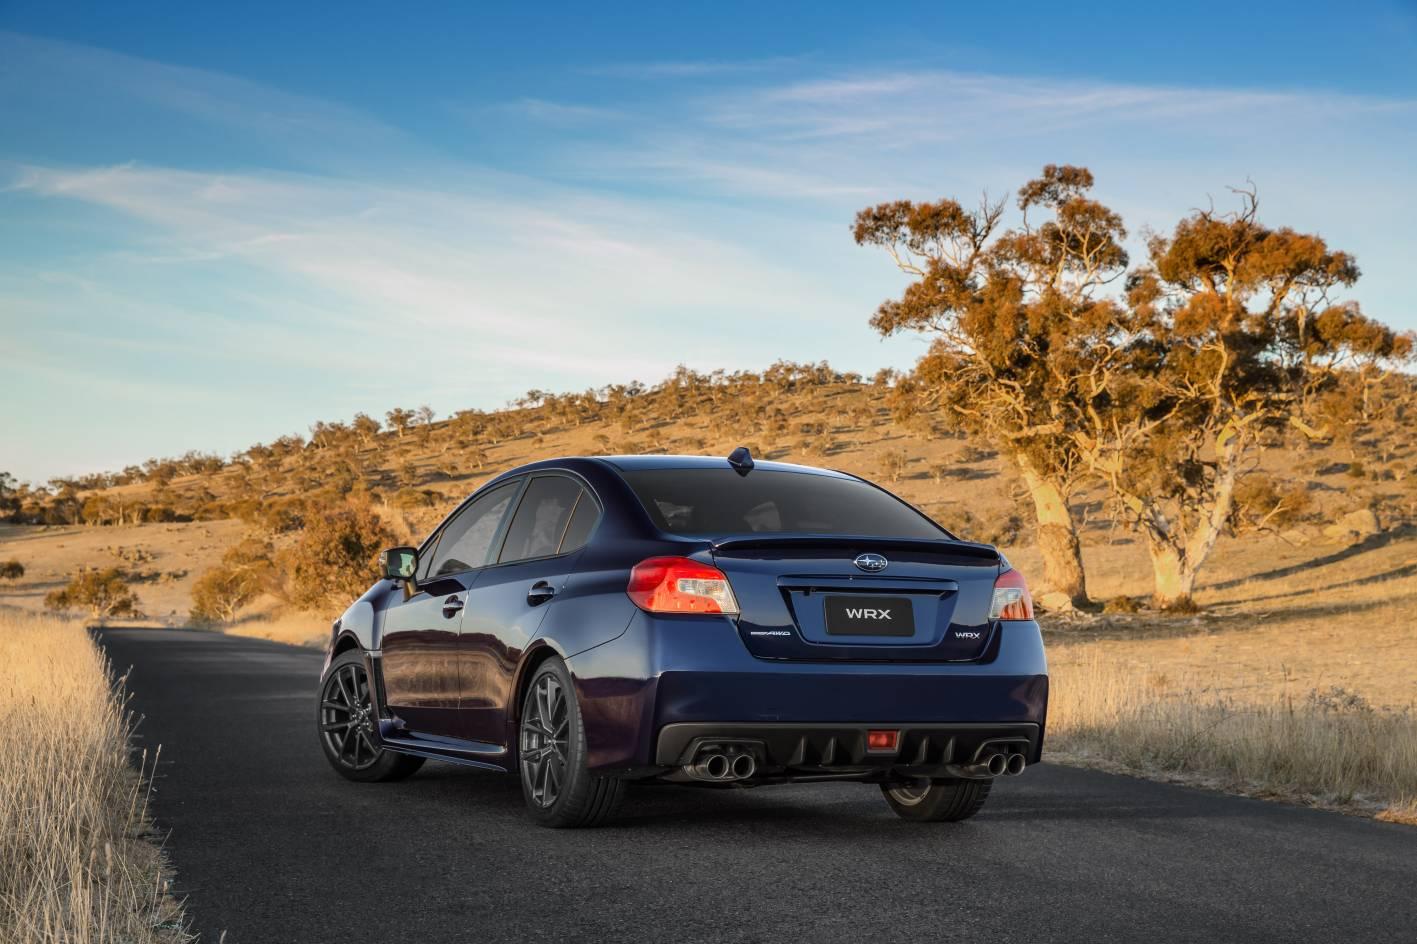 Subaru Outback Vs Impreza >> Updated 2018 Subaru WRX & WRX STI land, new spec.R tops range - ForceGT.com